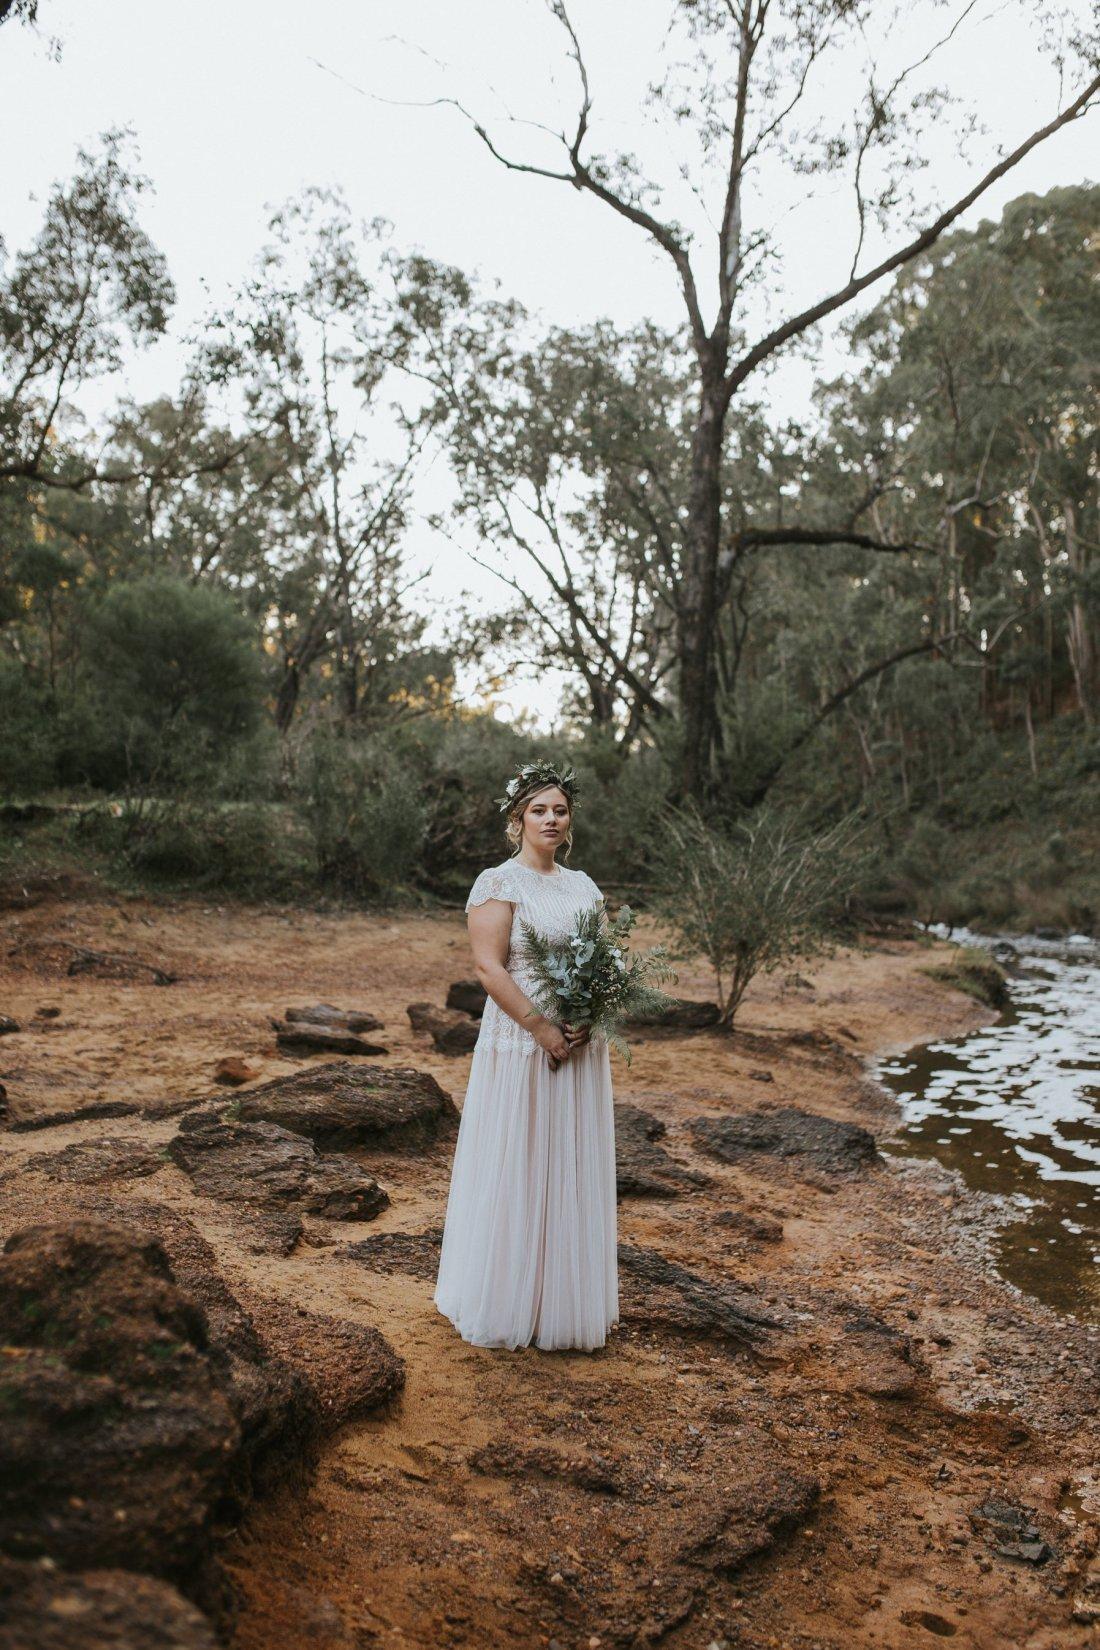 Perth Wedding Photographer | Ebony Blush Photography | Zoe Theiadore Photography | Wedding Photography | Stevie + Jay139